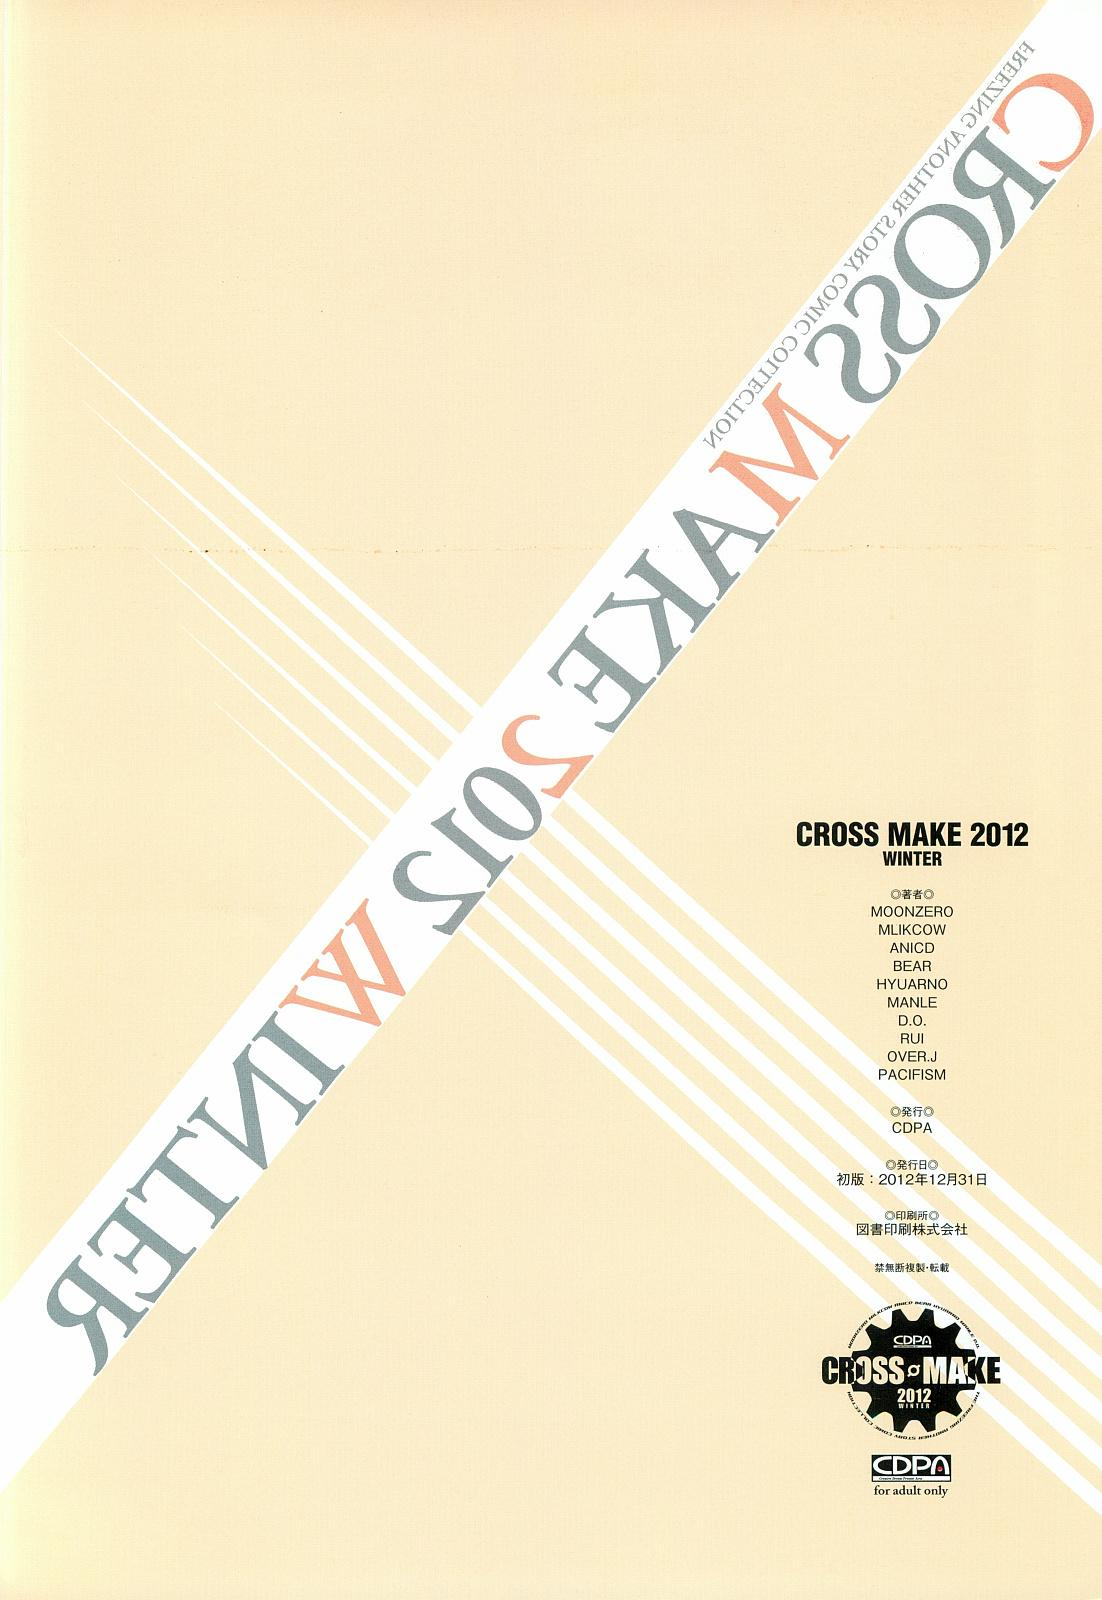 CROSS MAKE 2012 WINTER 129